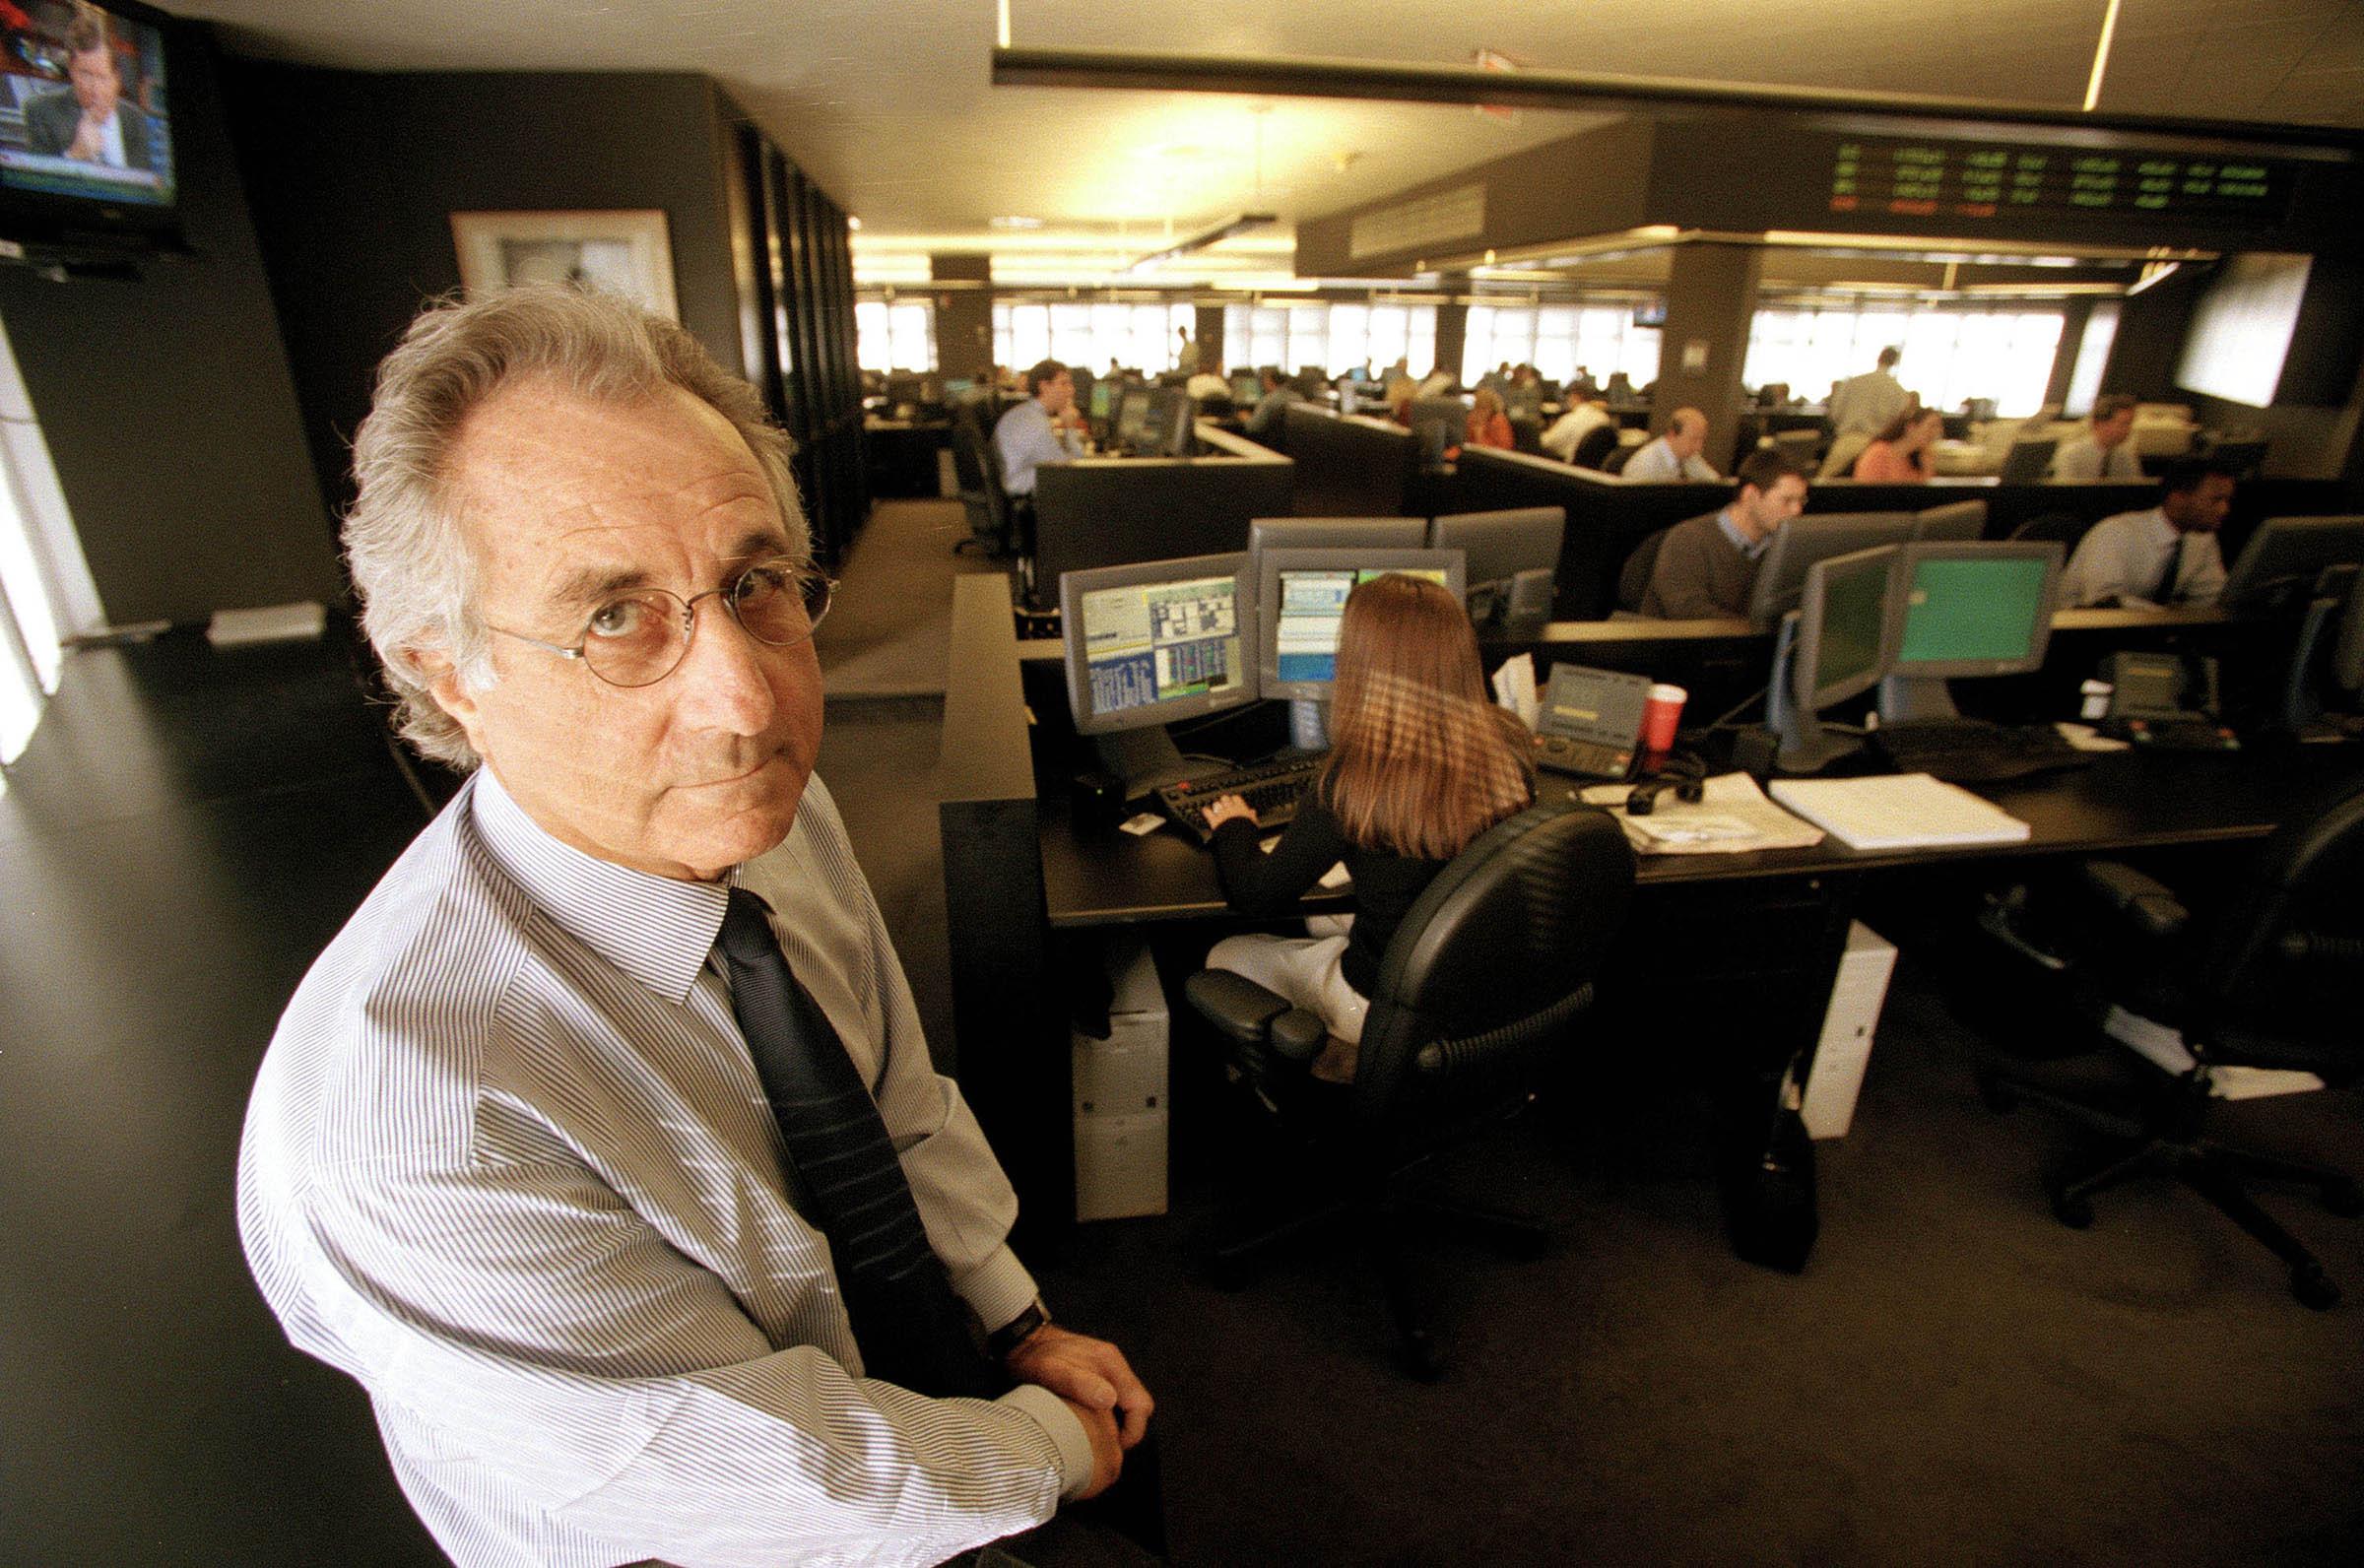 Bernard Madoff, chairman of Bernard L. Madoff Investment Securities, in his office in New York, on Dec. 30, 1999.